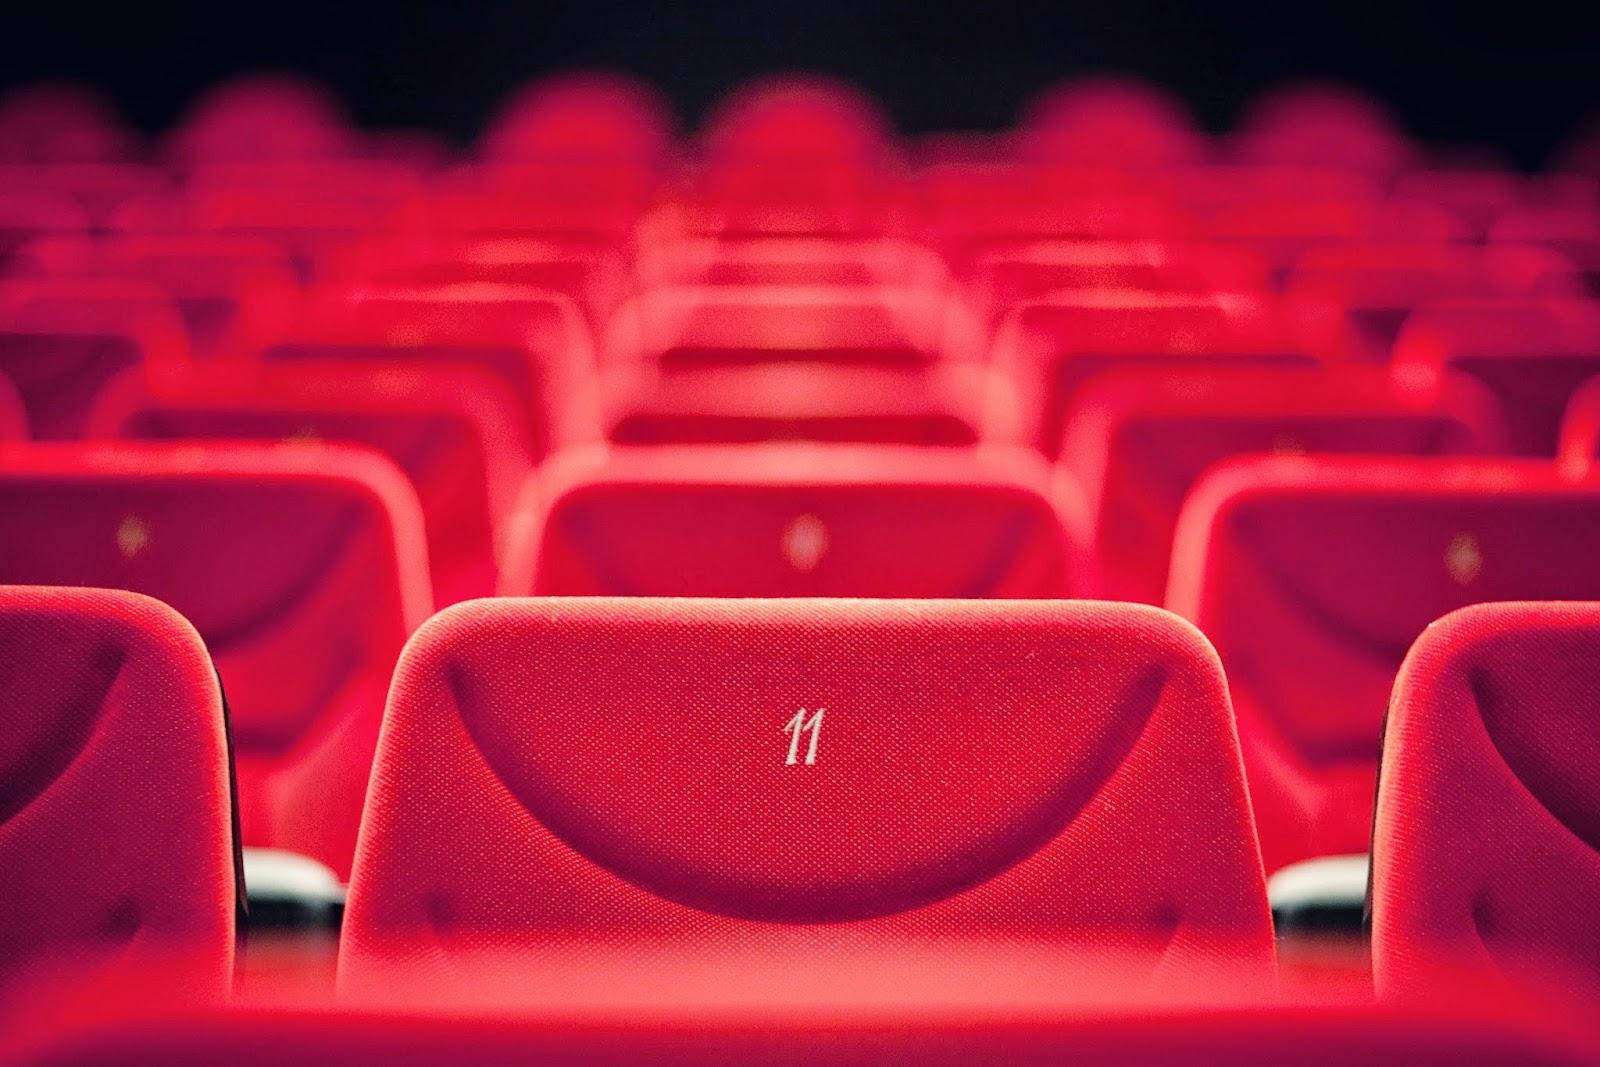 bangku bioskop rudiharto